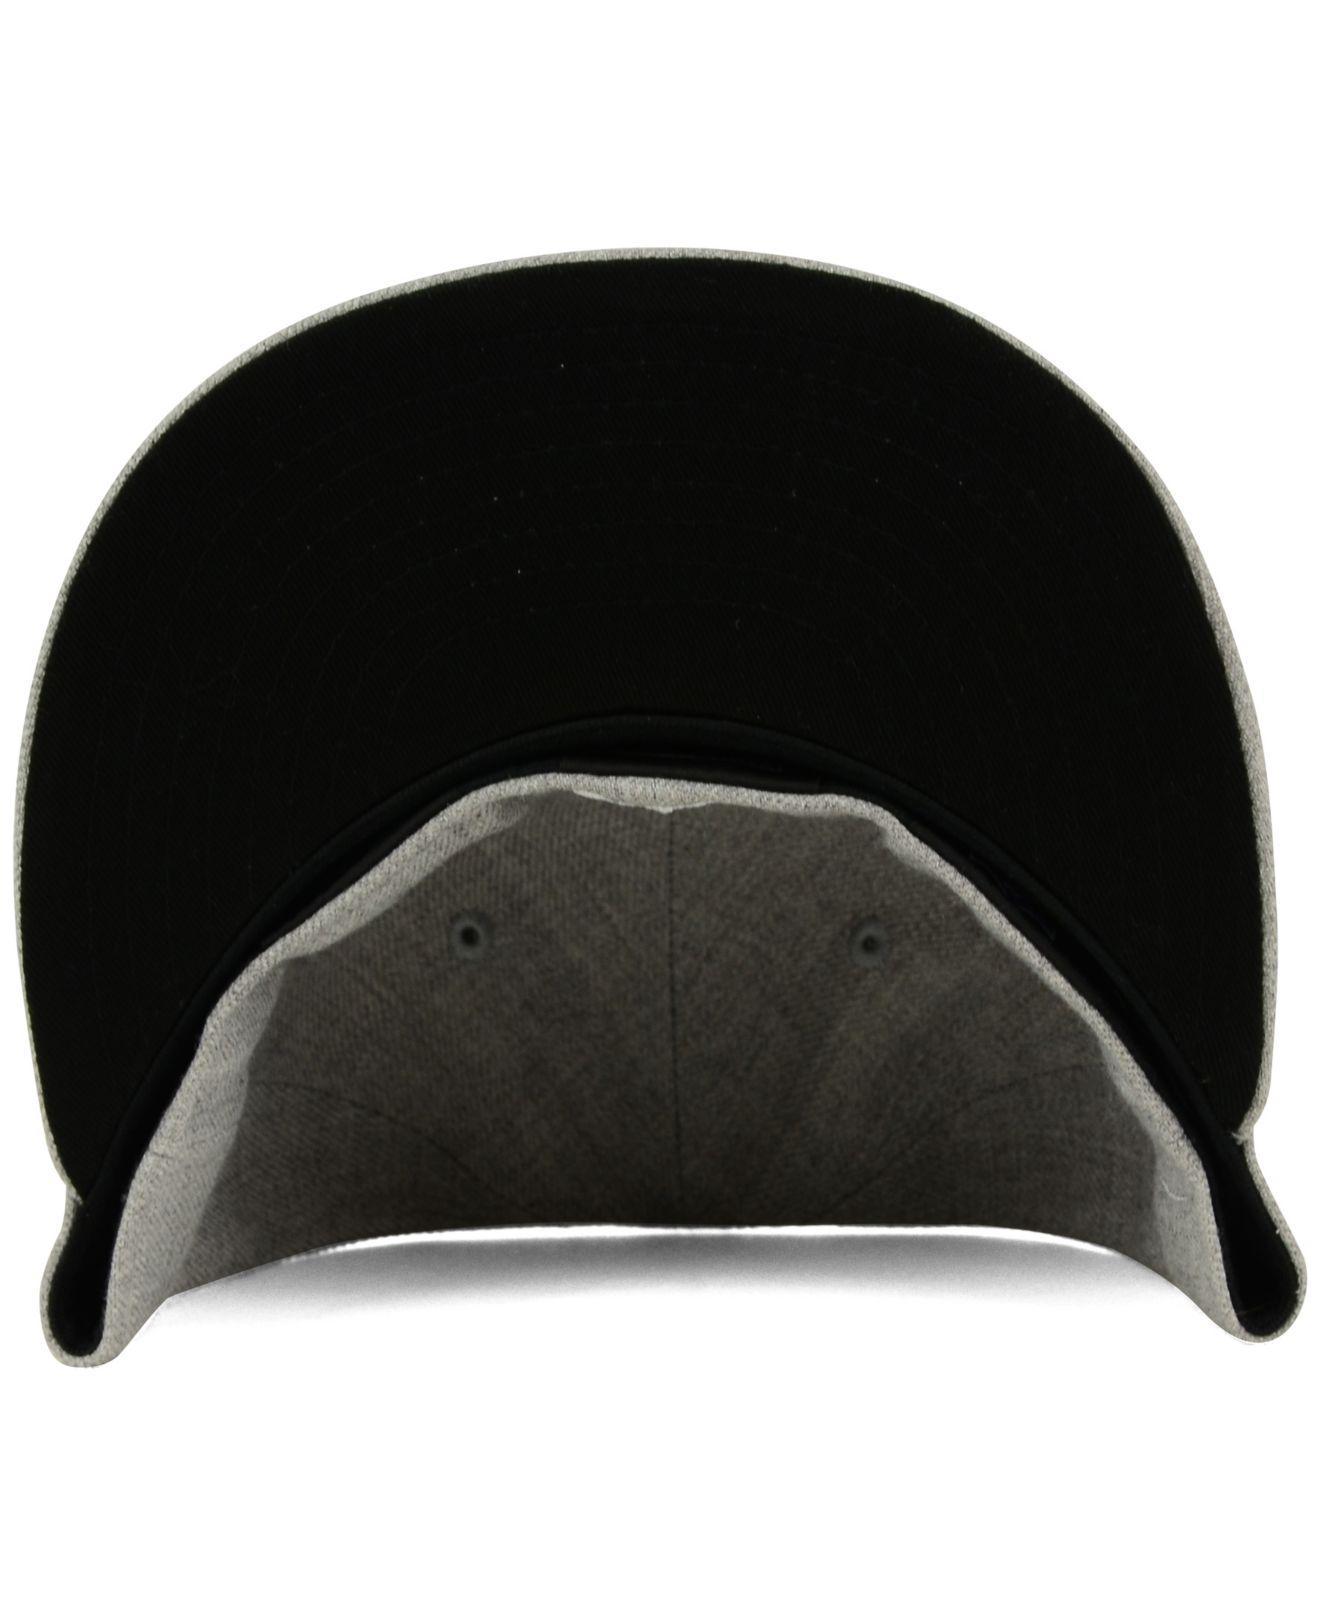 new product c8e62 68747 ... Houston Texans Heather Black White 59fifty Cap for Men - Lyst. View  fullscreen